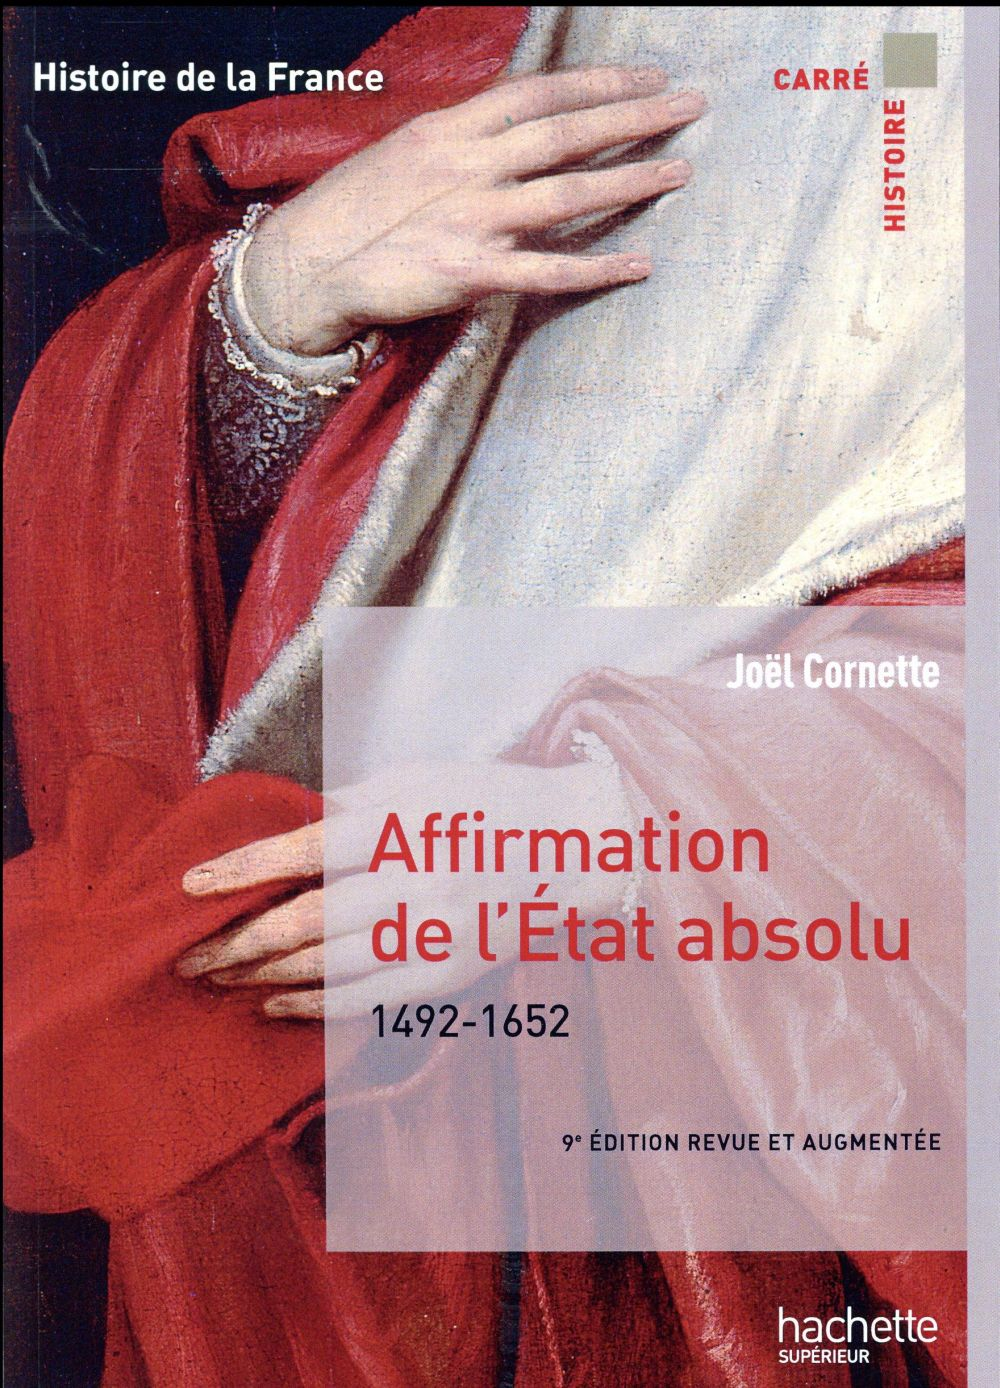 AFFIRMATION DE L'ETAT ABSOLU  -  1492-1652 (9E EDITION)